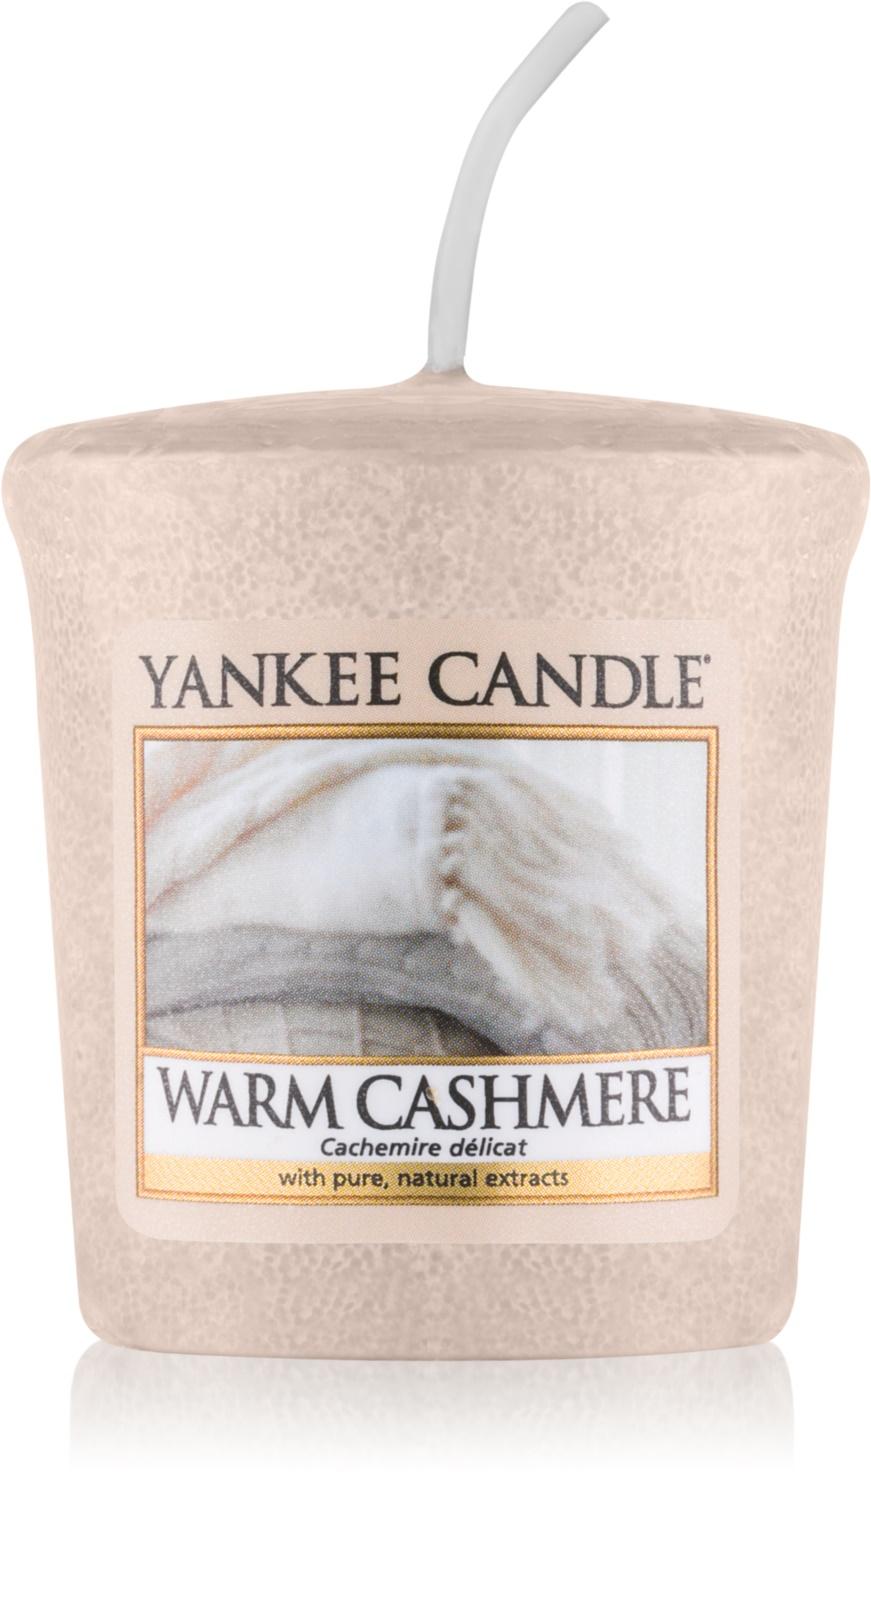 yankee-candle-warm-cashmere-viaszos-gyertya_5.jpg